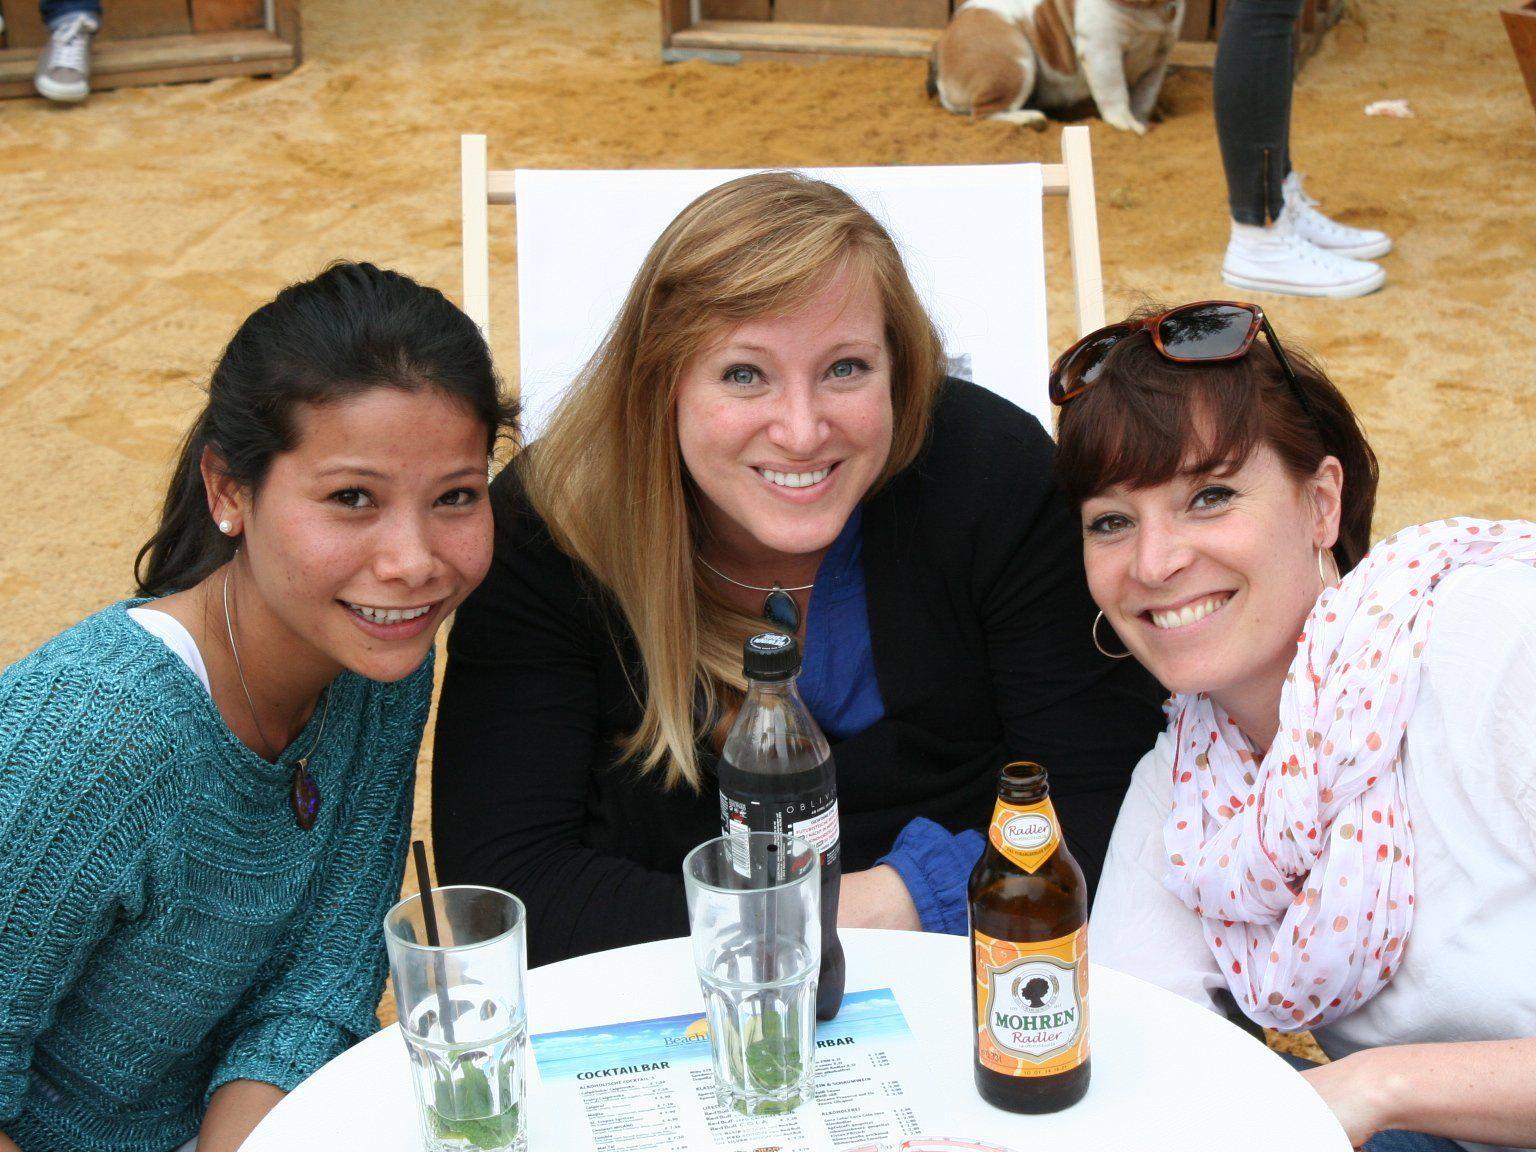 Beach-Bar in Bregenz wird eröffnet